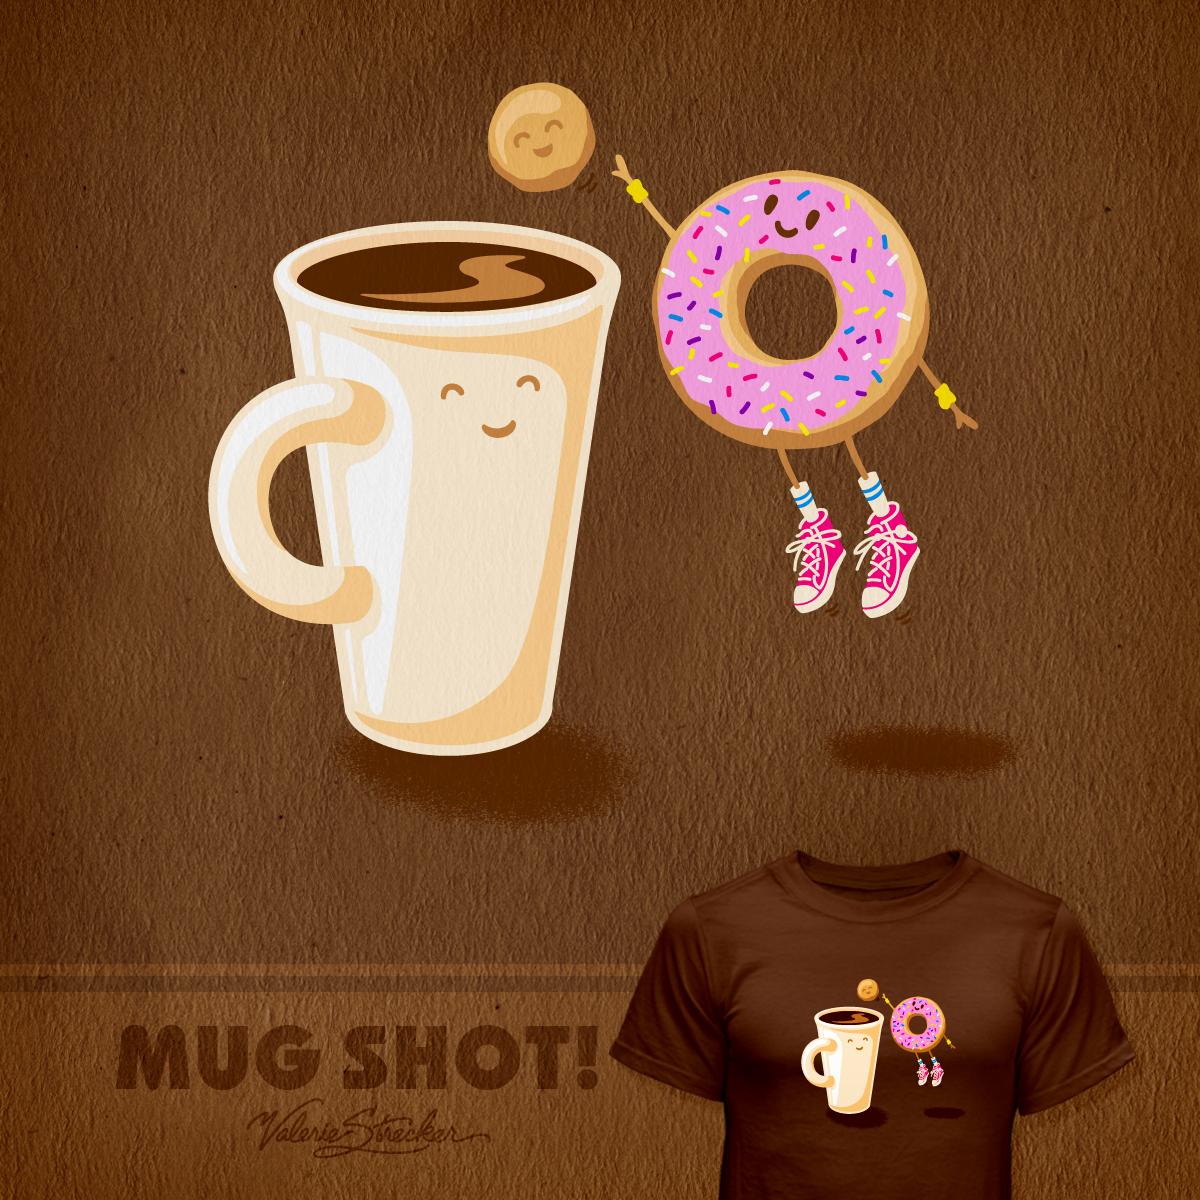 MUG SHOT! by ValerieStrecker on Threadless